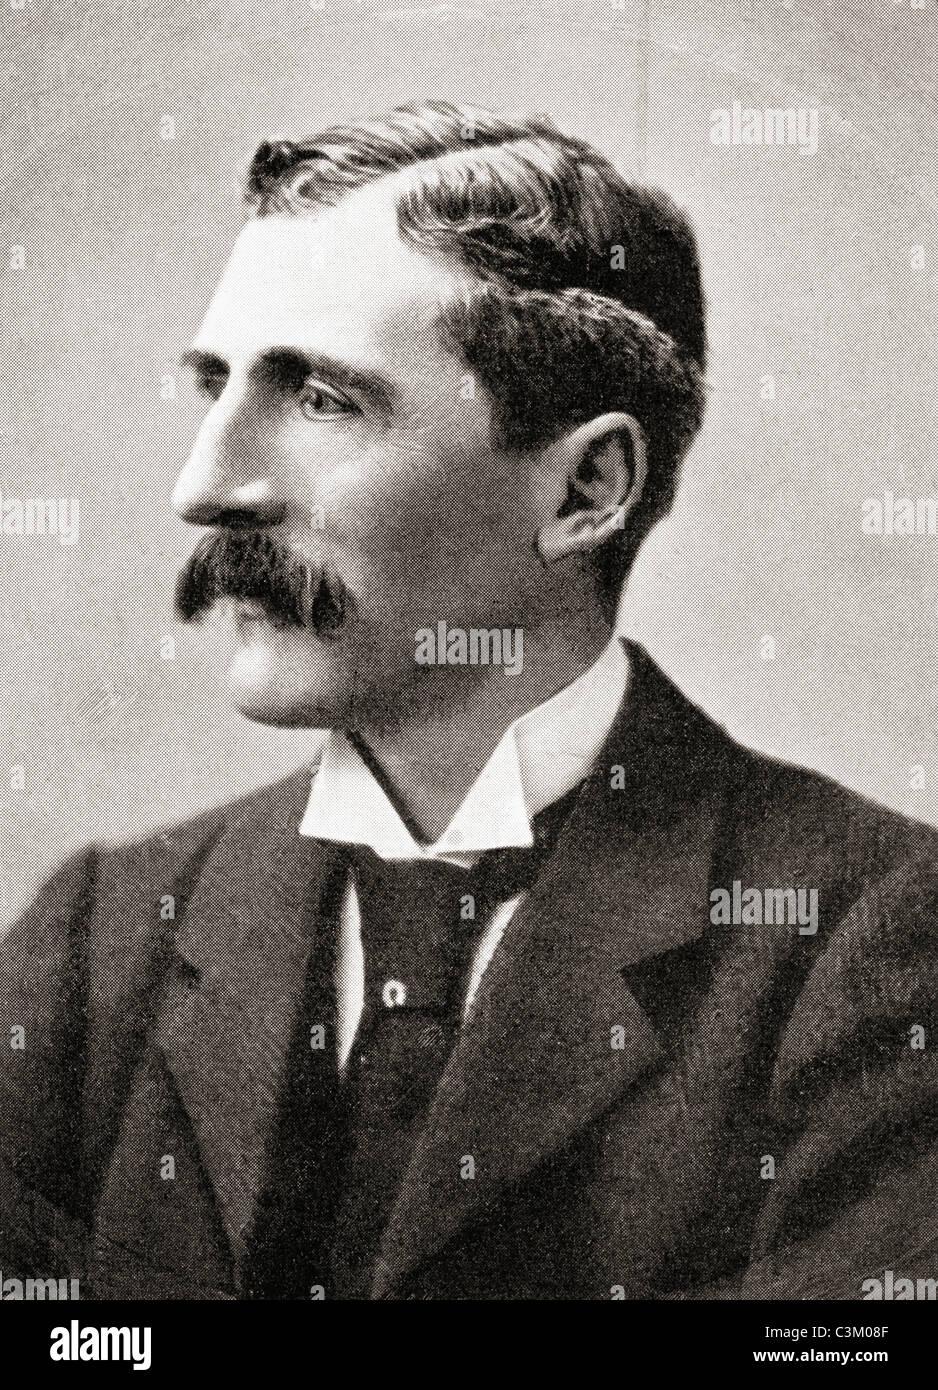 George Denison Faber, 1st Baron Wittenham, 1852 – 1931. British Conservative Party politician. - Stock Image